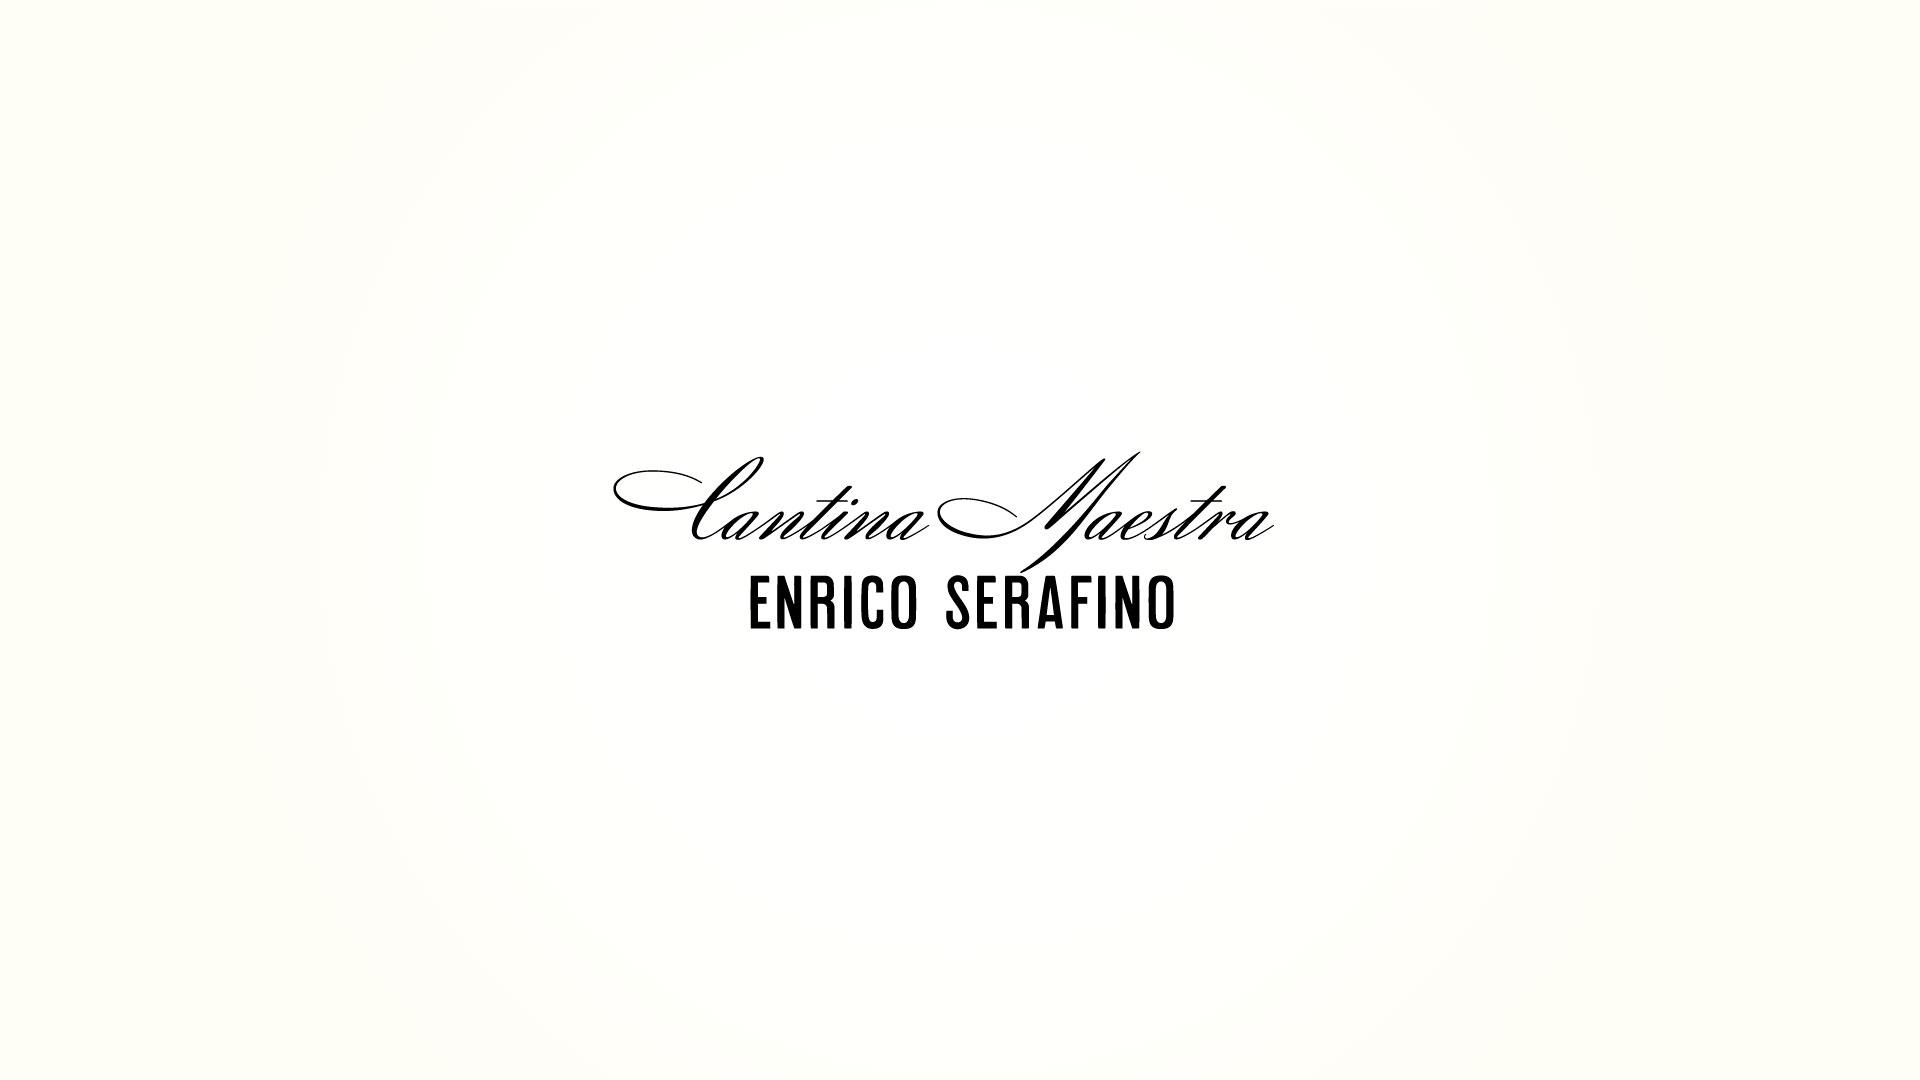 Enrico Serafino Cantina Maestra brand